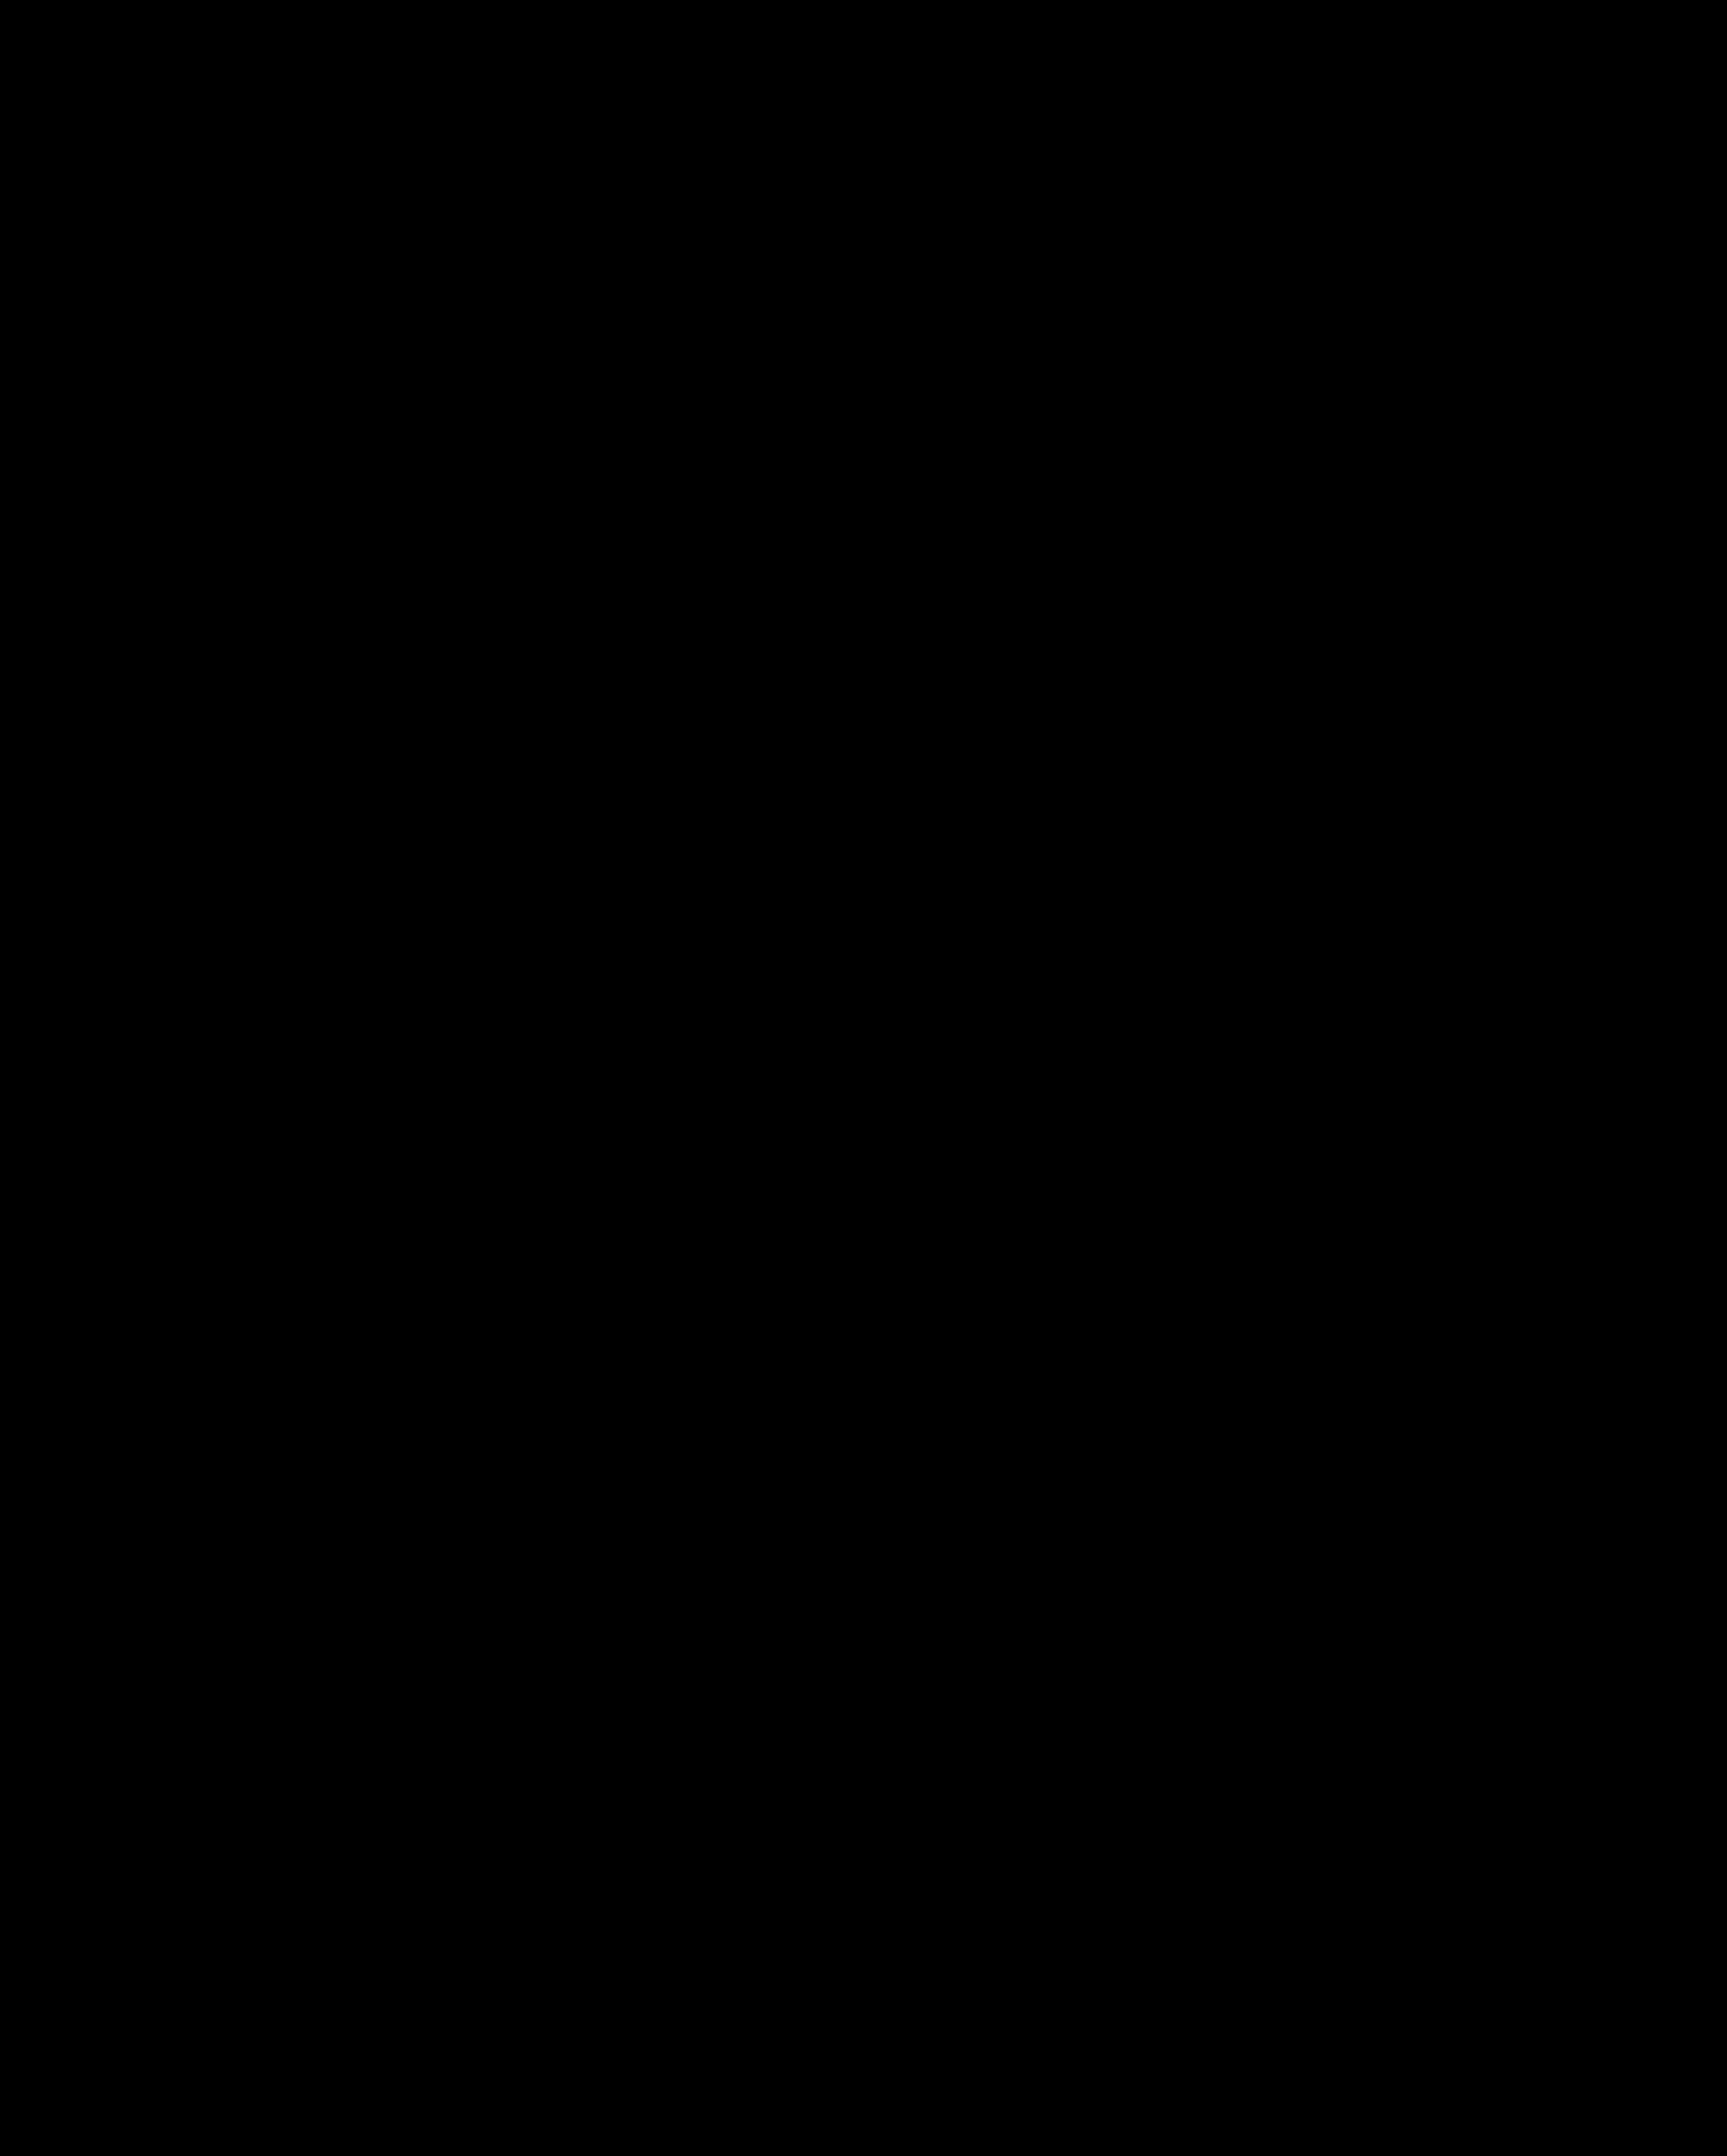 f41f179b78c810 Versace – Logos Download